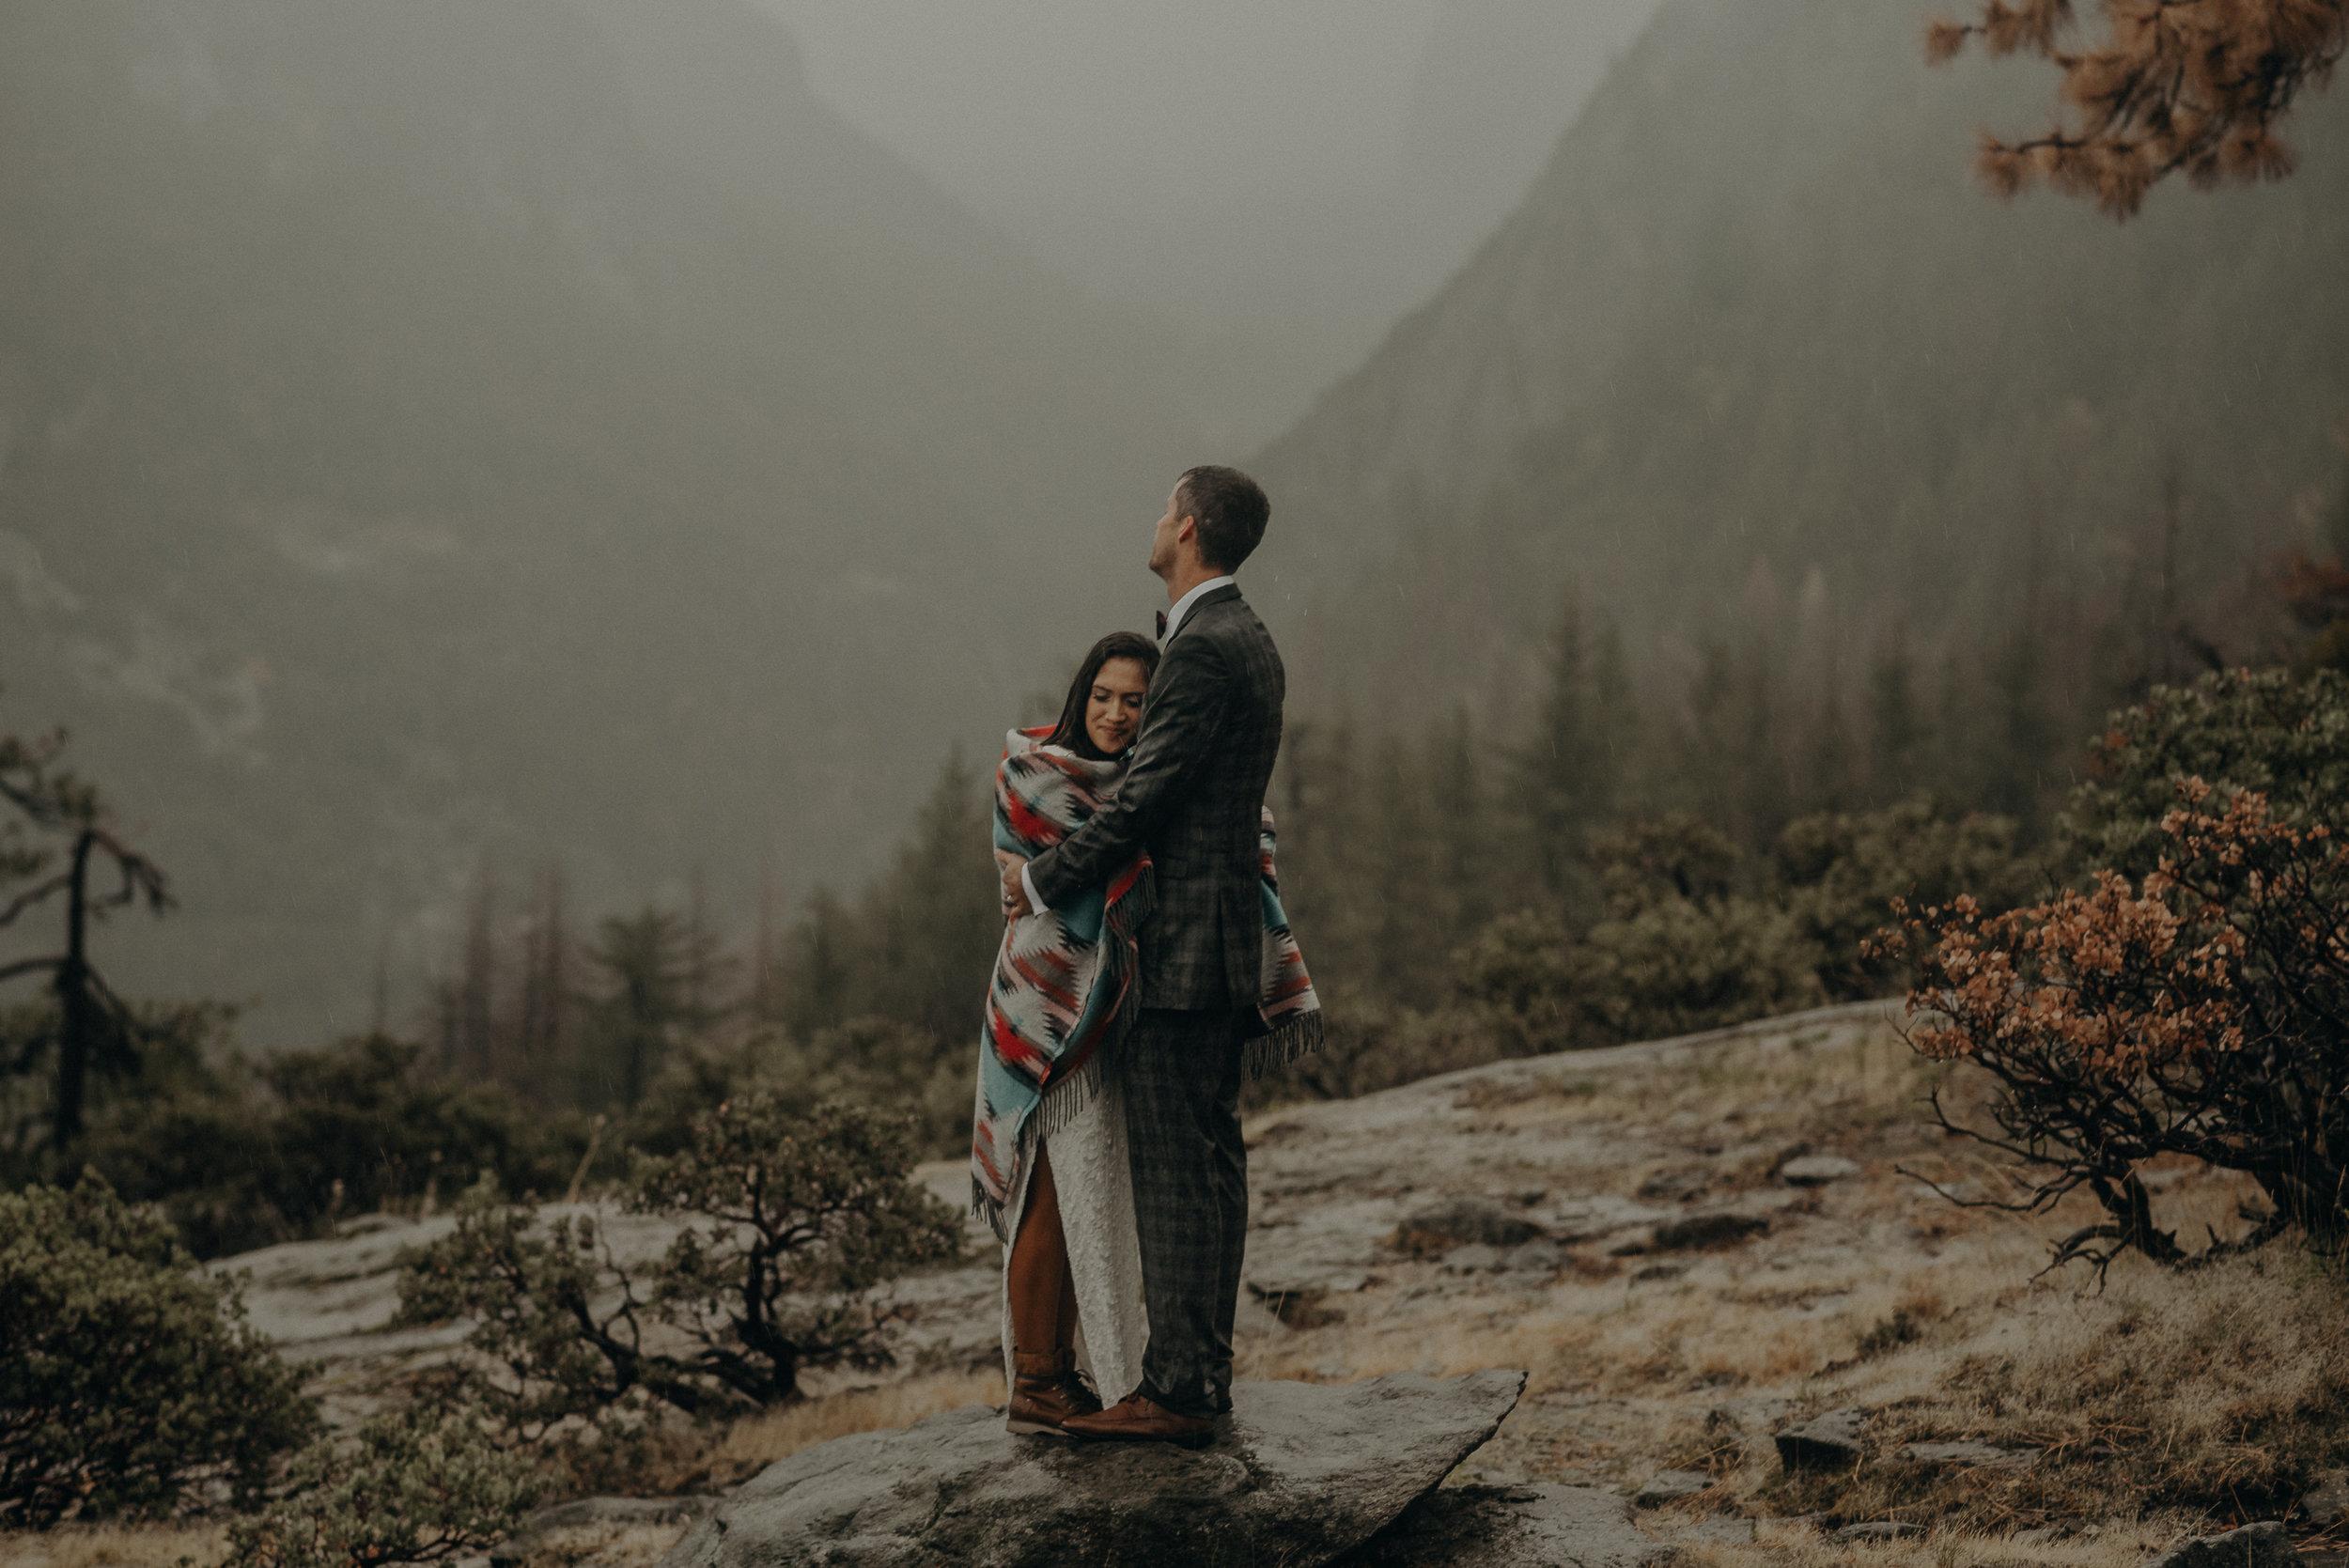 Isaiah + Taylor Photography - Yosemite Elopement - Los Angeles Wedding Photographer-48.jpg